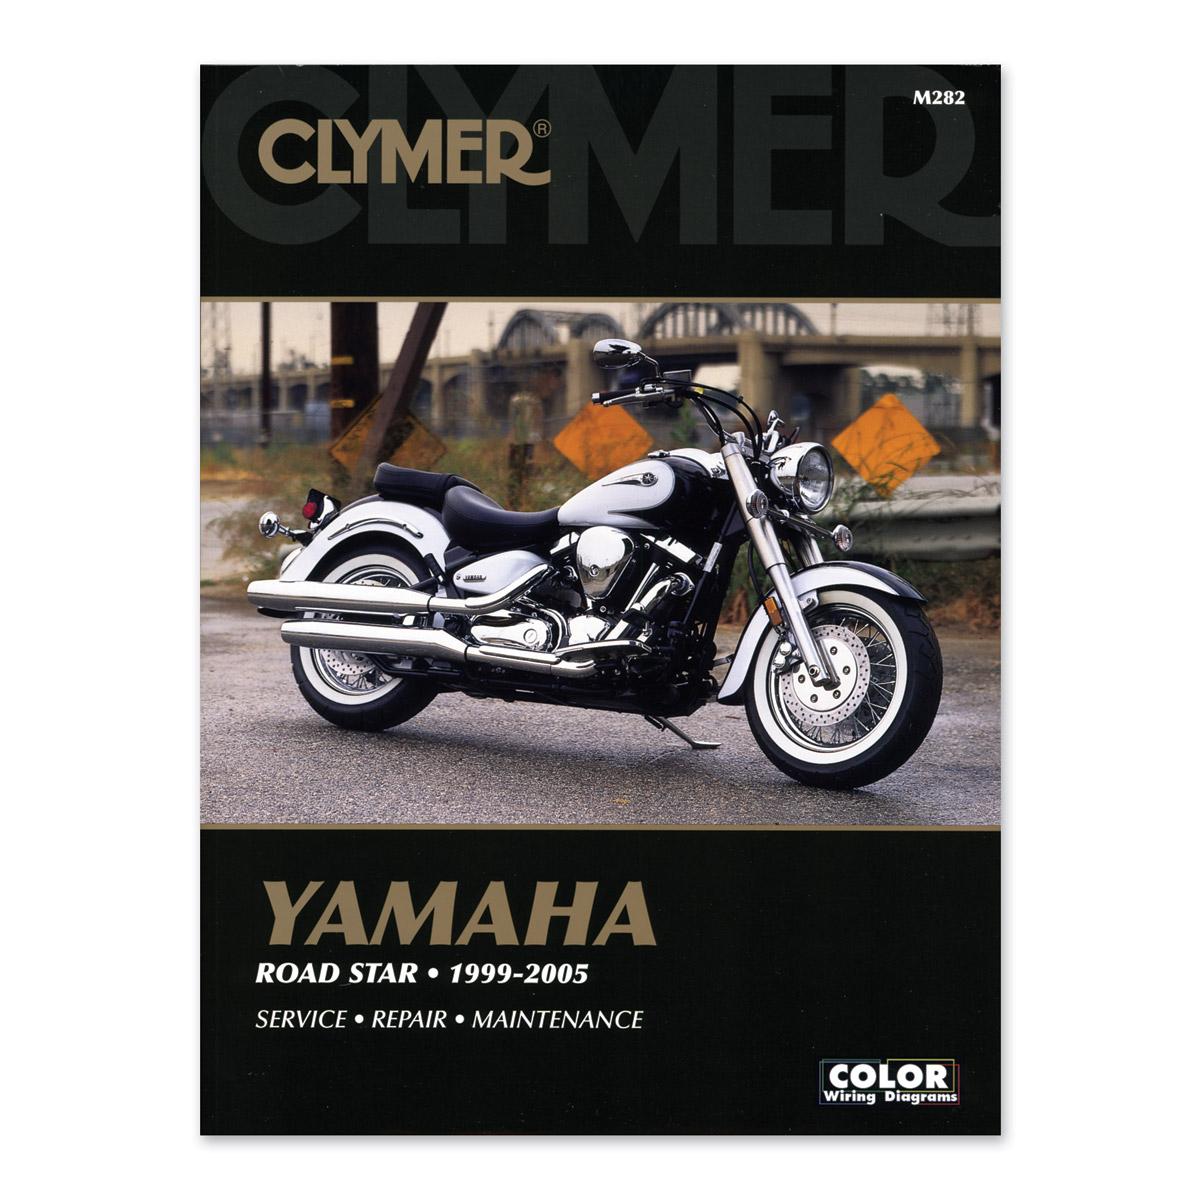 clymer yamaha motorcycle repair manual zz16860 j p cycles rh jpcycles com motorcycle service manual download motorcycle service manual pdf